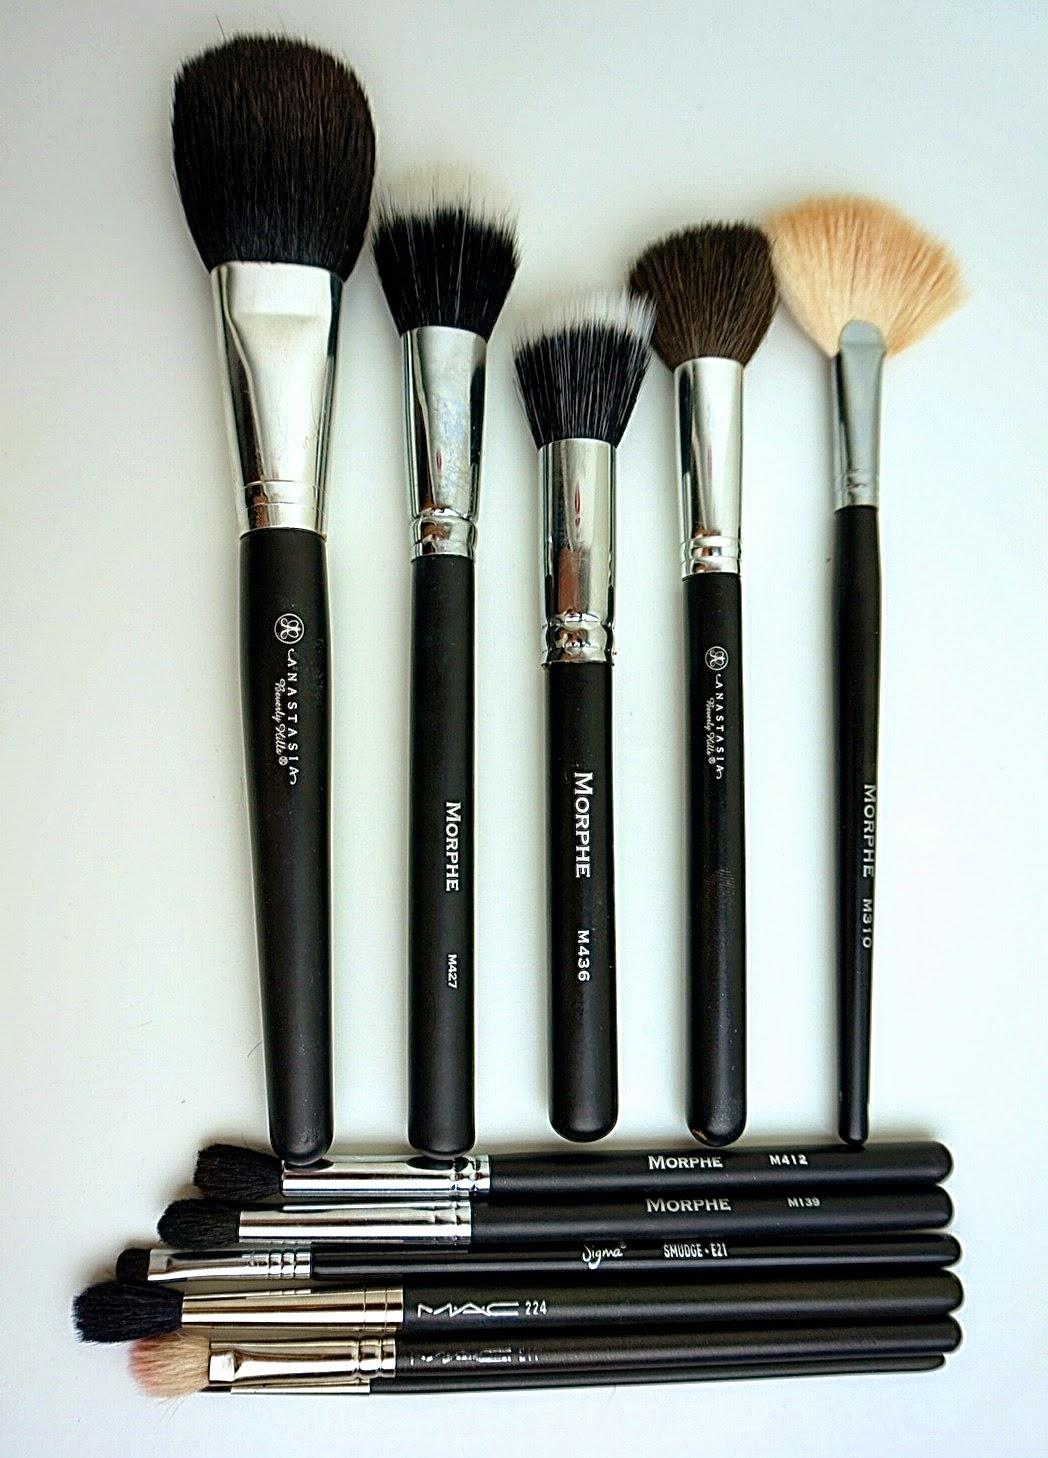 Beauty Fashion Lifestyle Favorite Brushes Оооооой, привет всем, вы кру я кру. beauty fashion lifestyle blogger